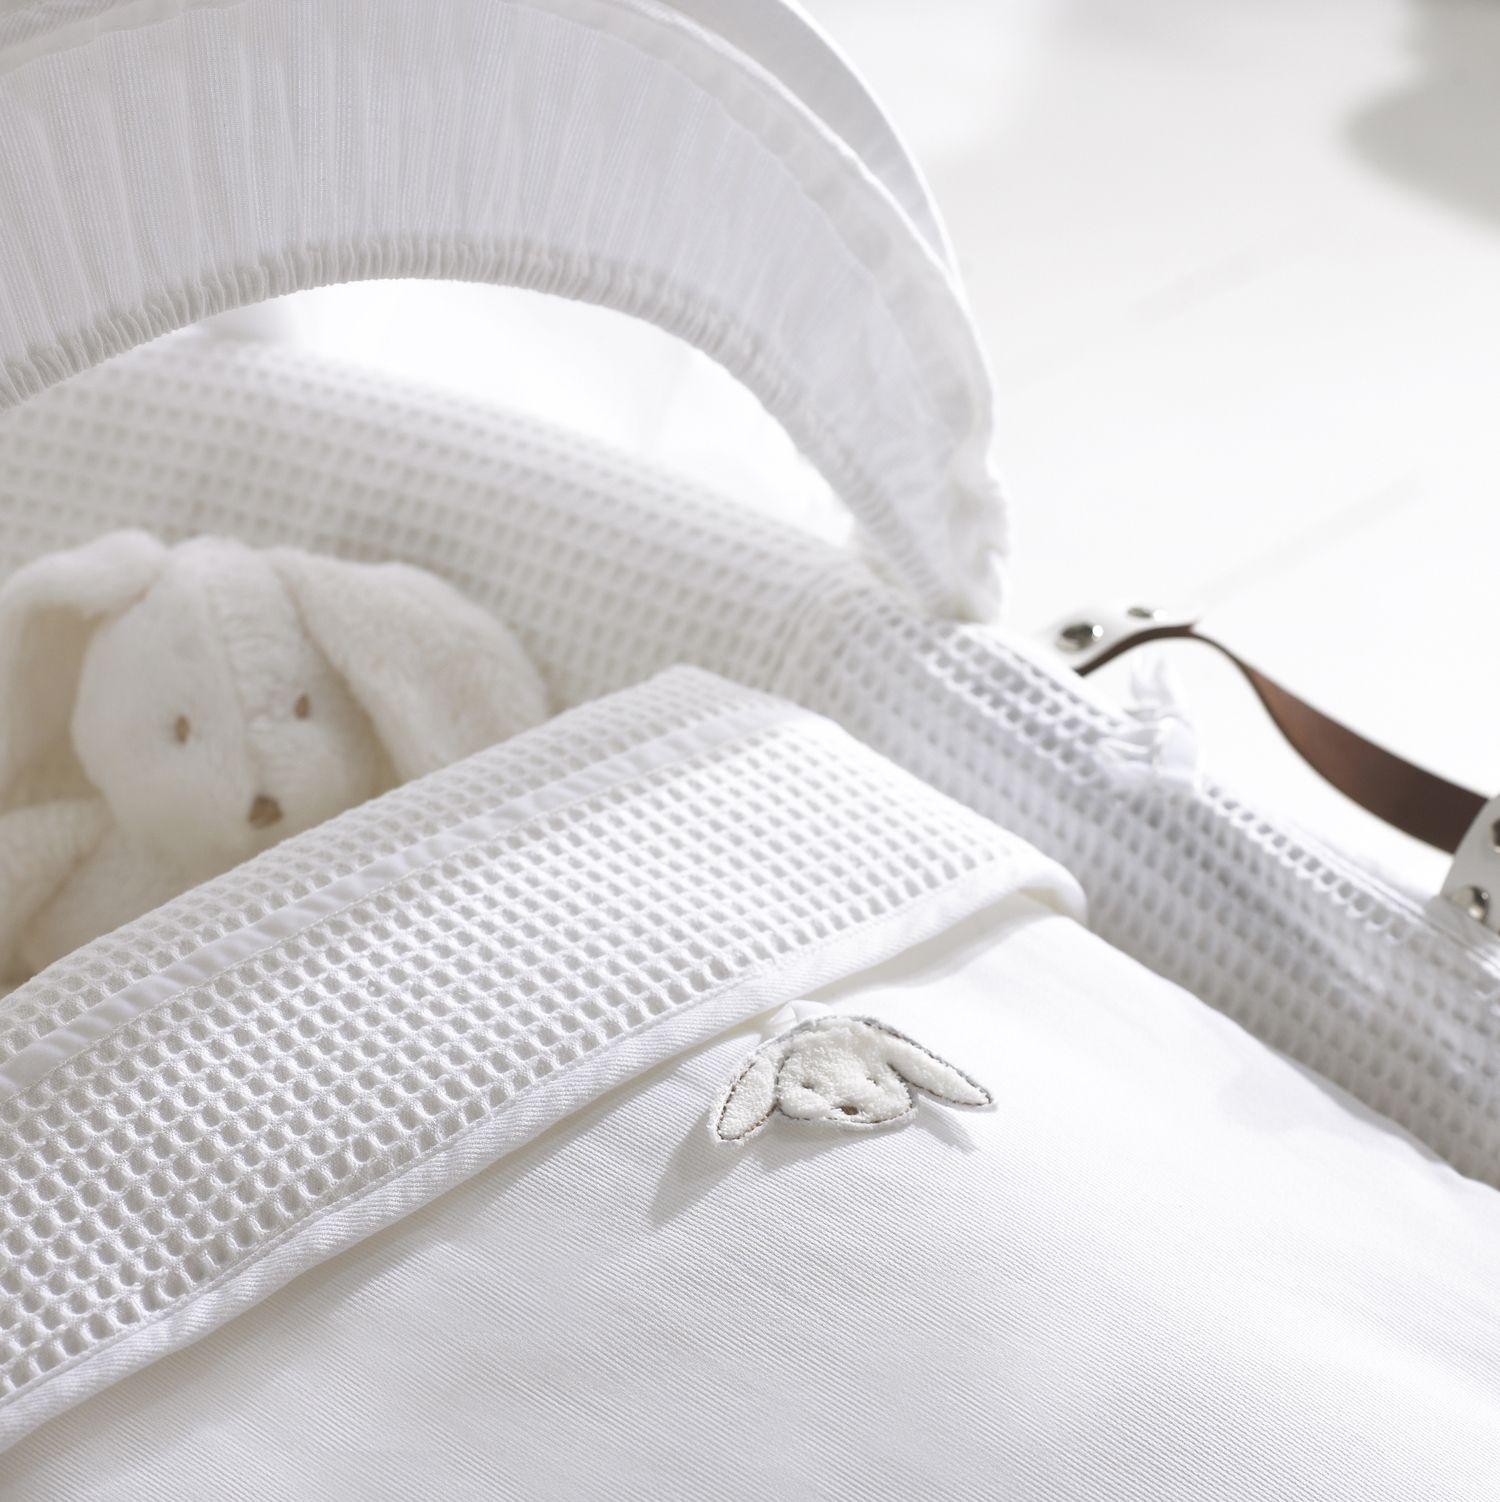 Baby cribs moses baskets - Gift Moses Basket Bedding Dressing Set Moses Basket Beddingbaby Cribsbaby